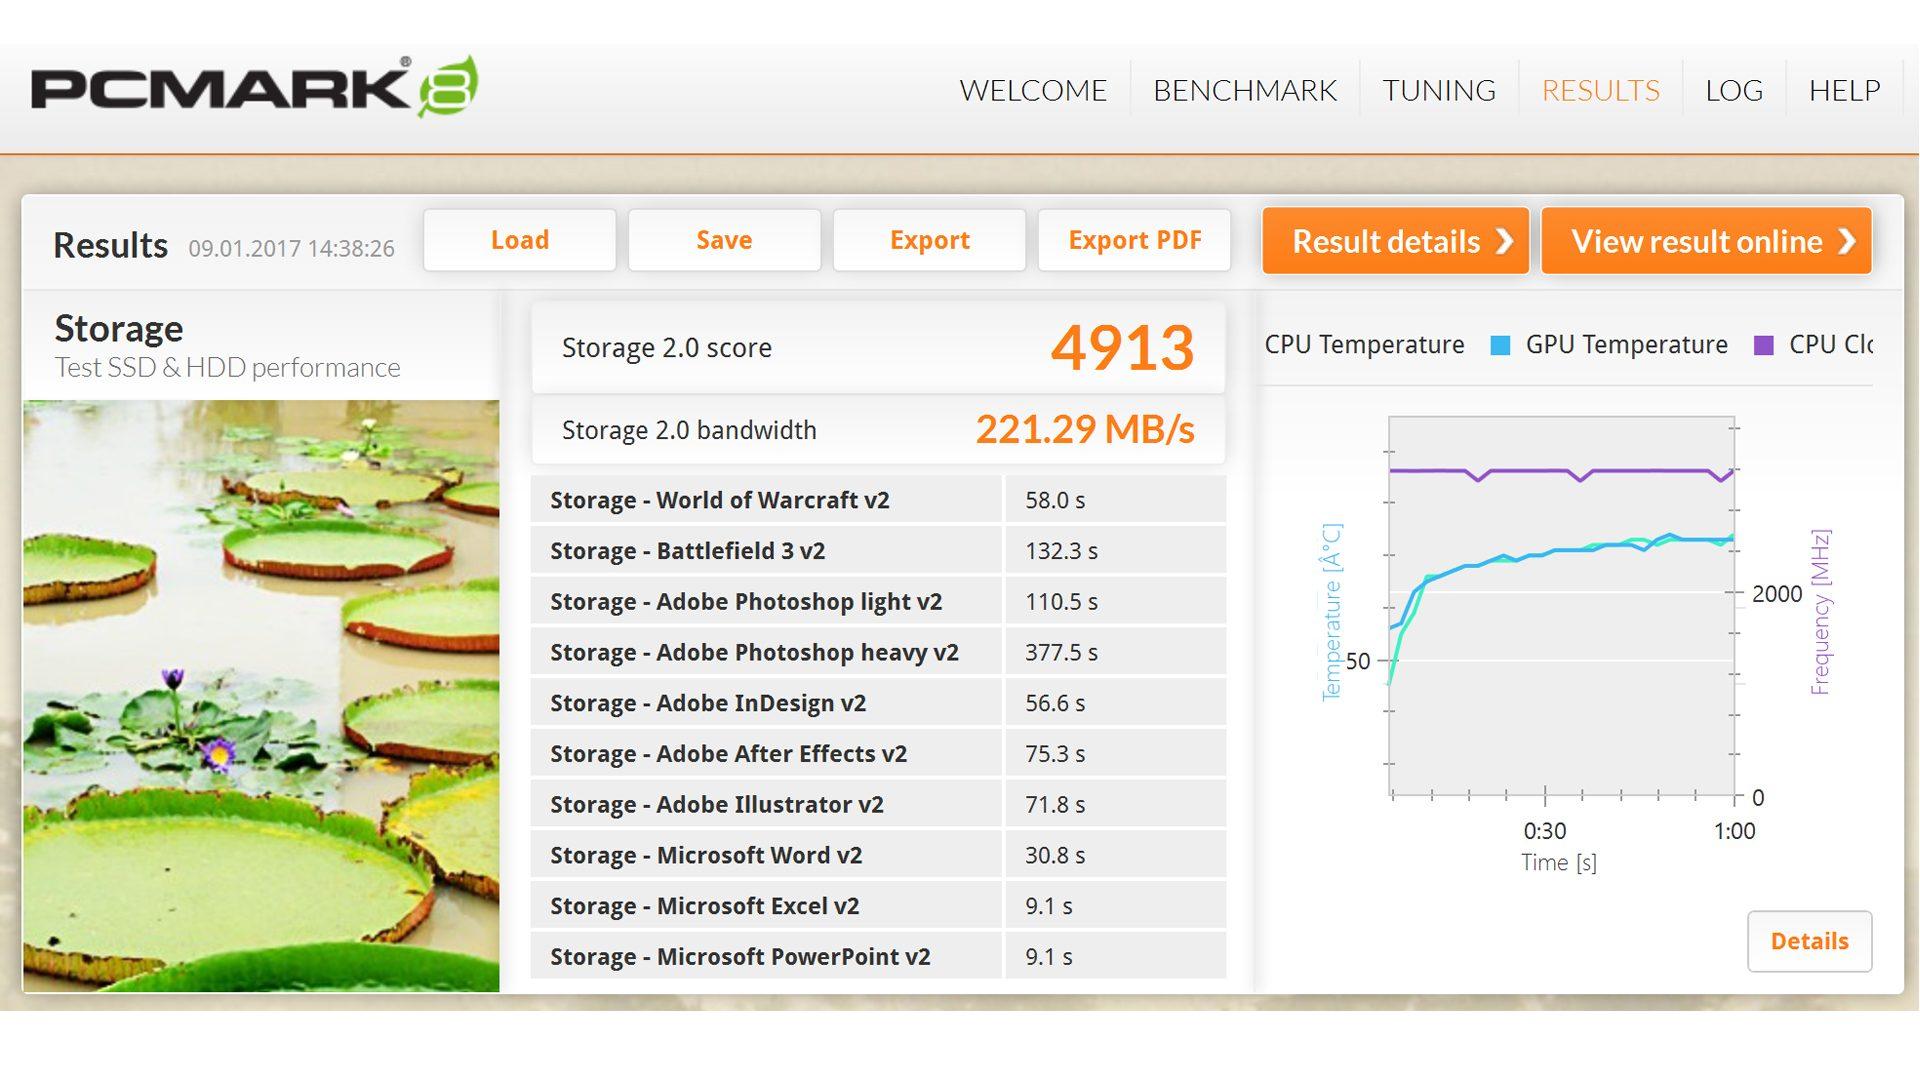 HP-Spectre-x360-OLED-13-4203ng-Benchmark_5